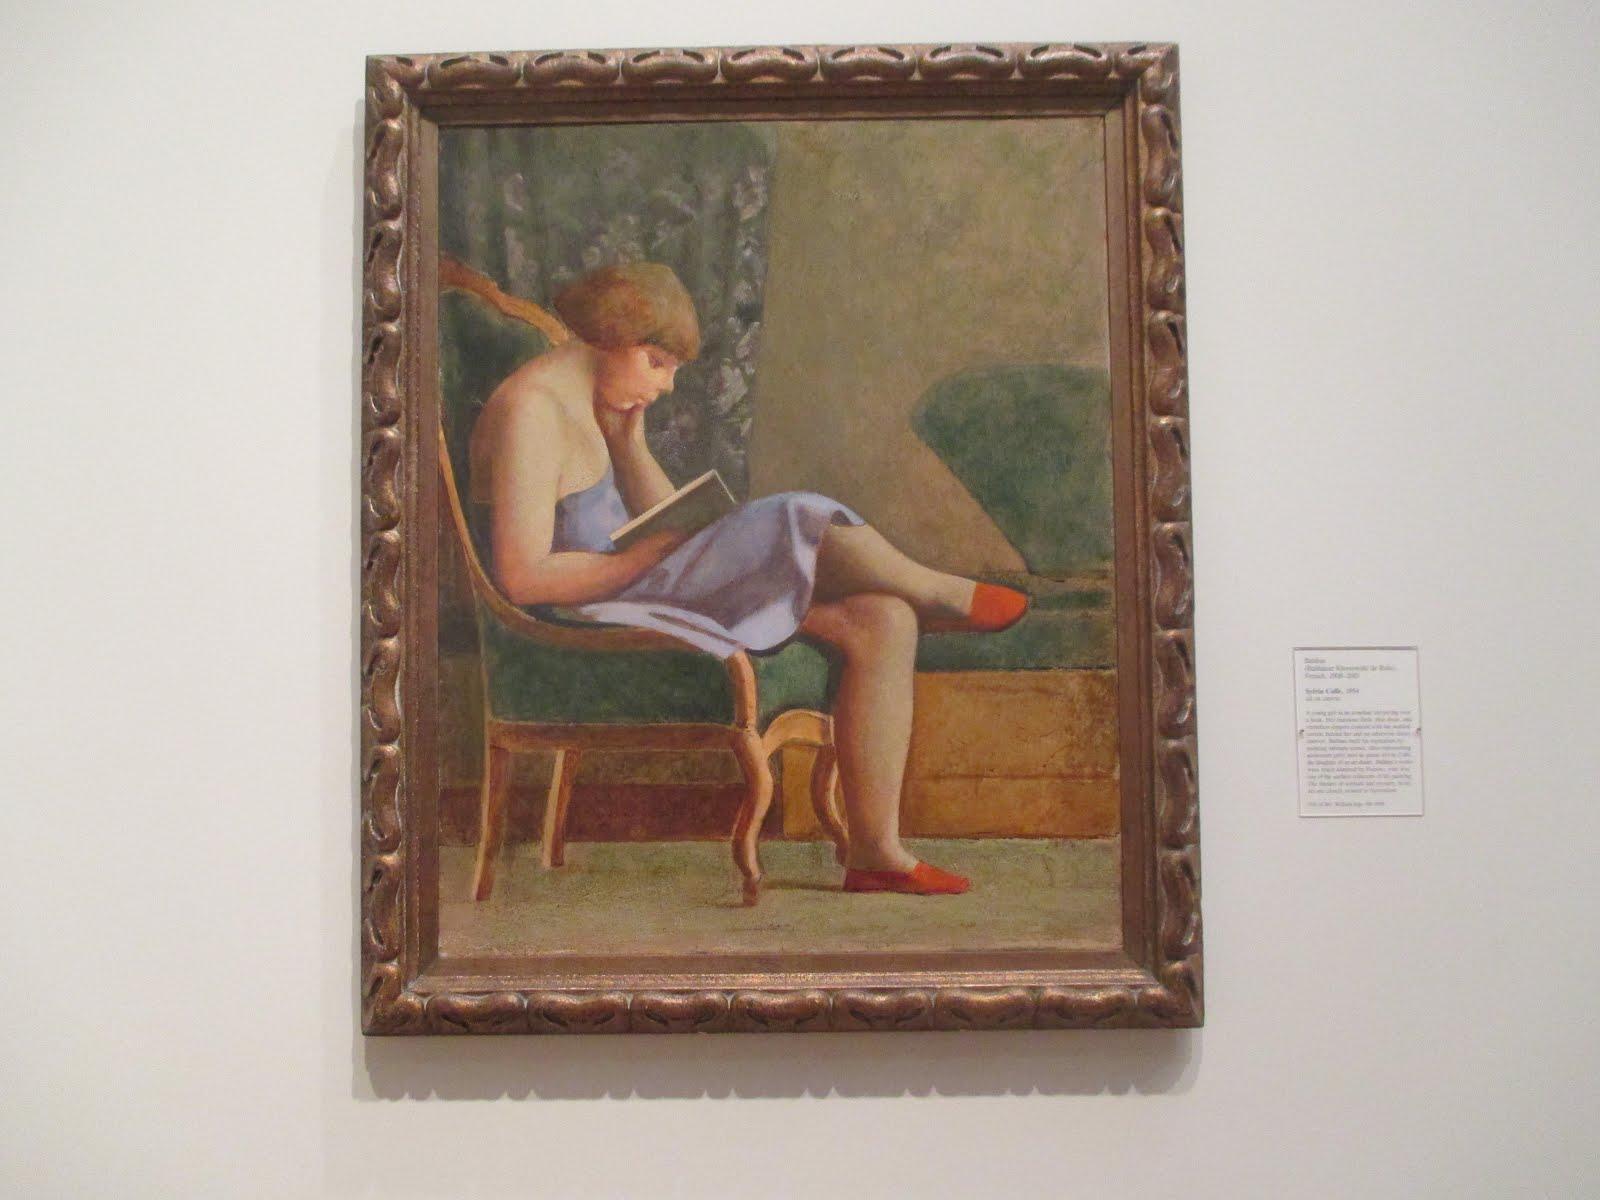 ST-LOUIS ART MUSEUM